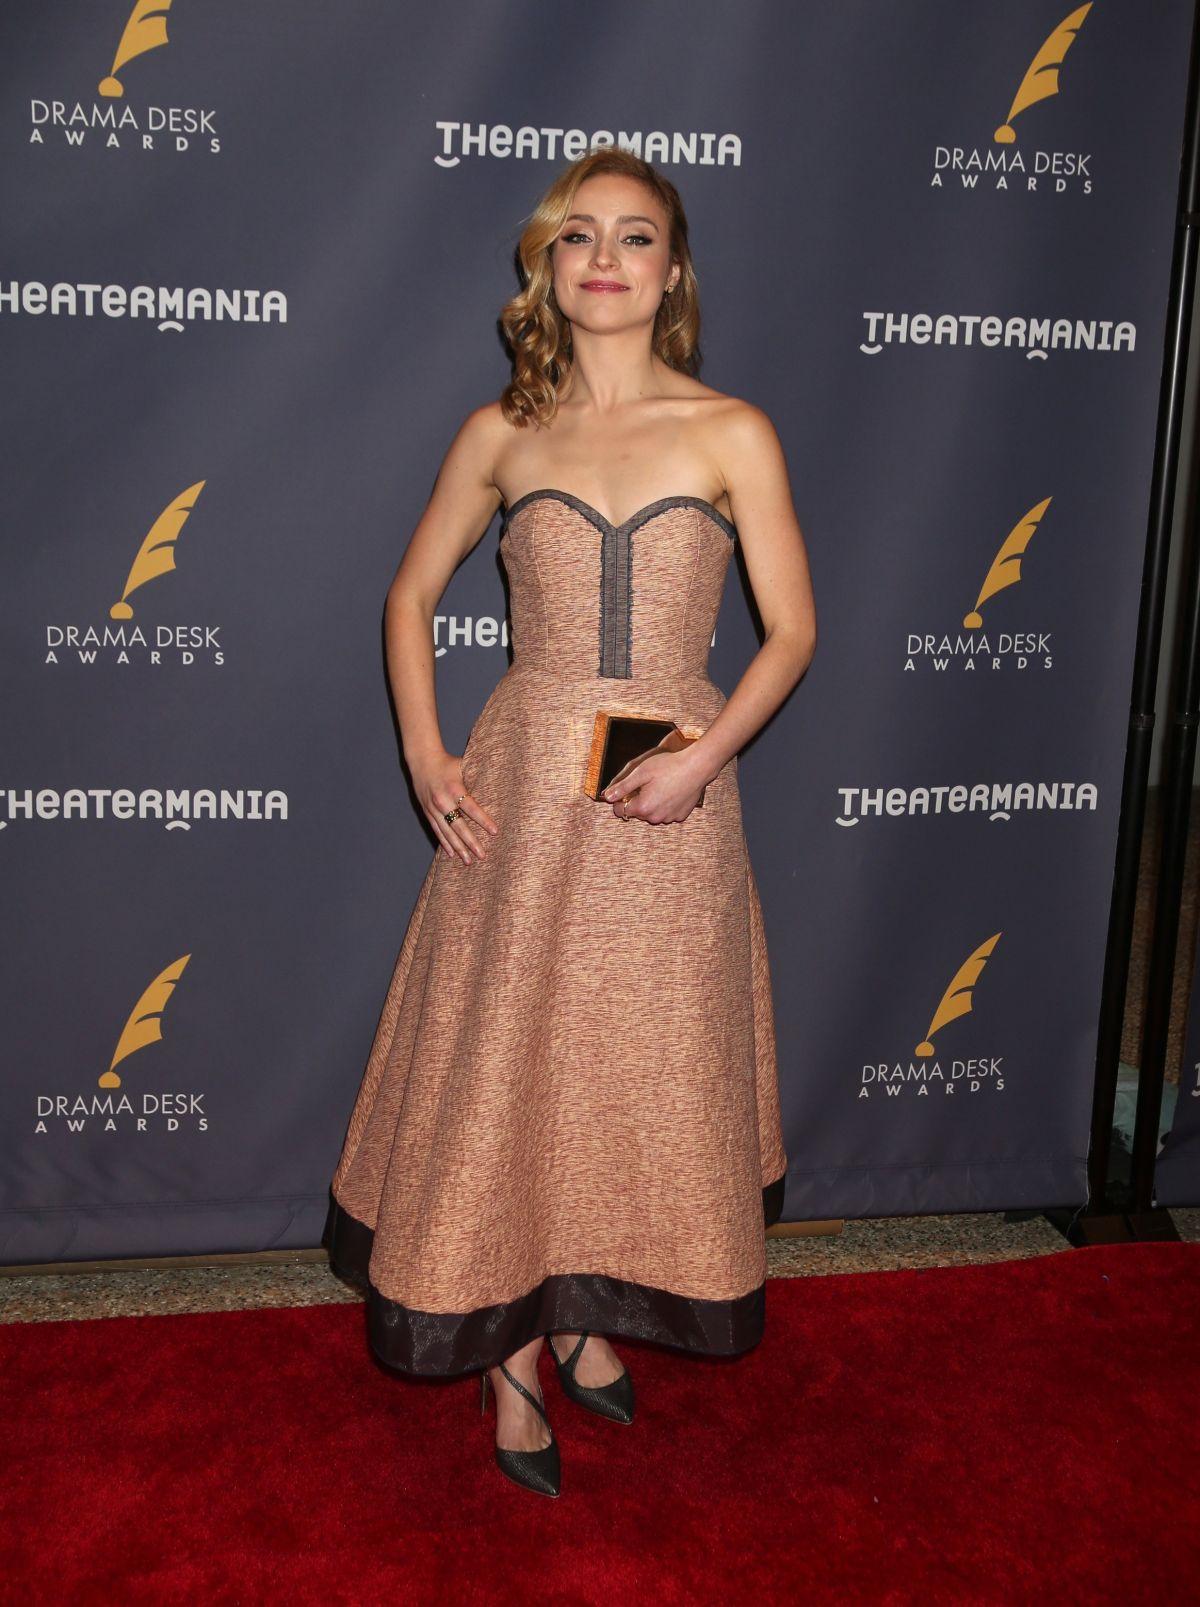 CHRISTY ALTOMARE at 2017 Drama Desk Awards in New York 06/04/2017